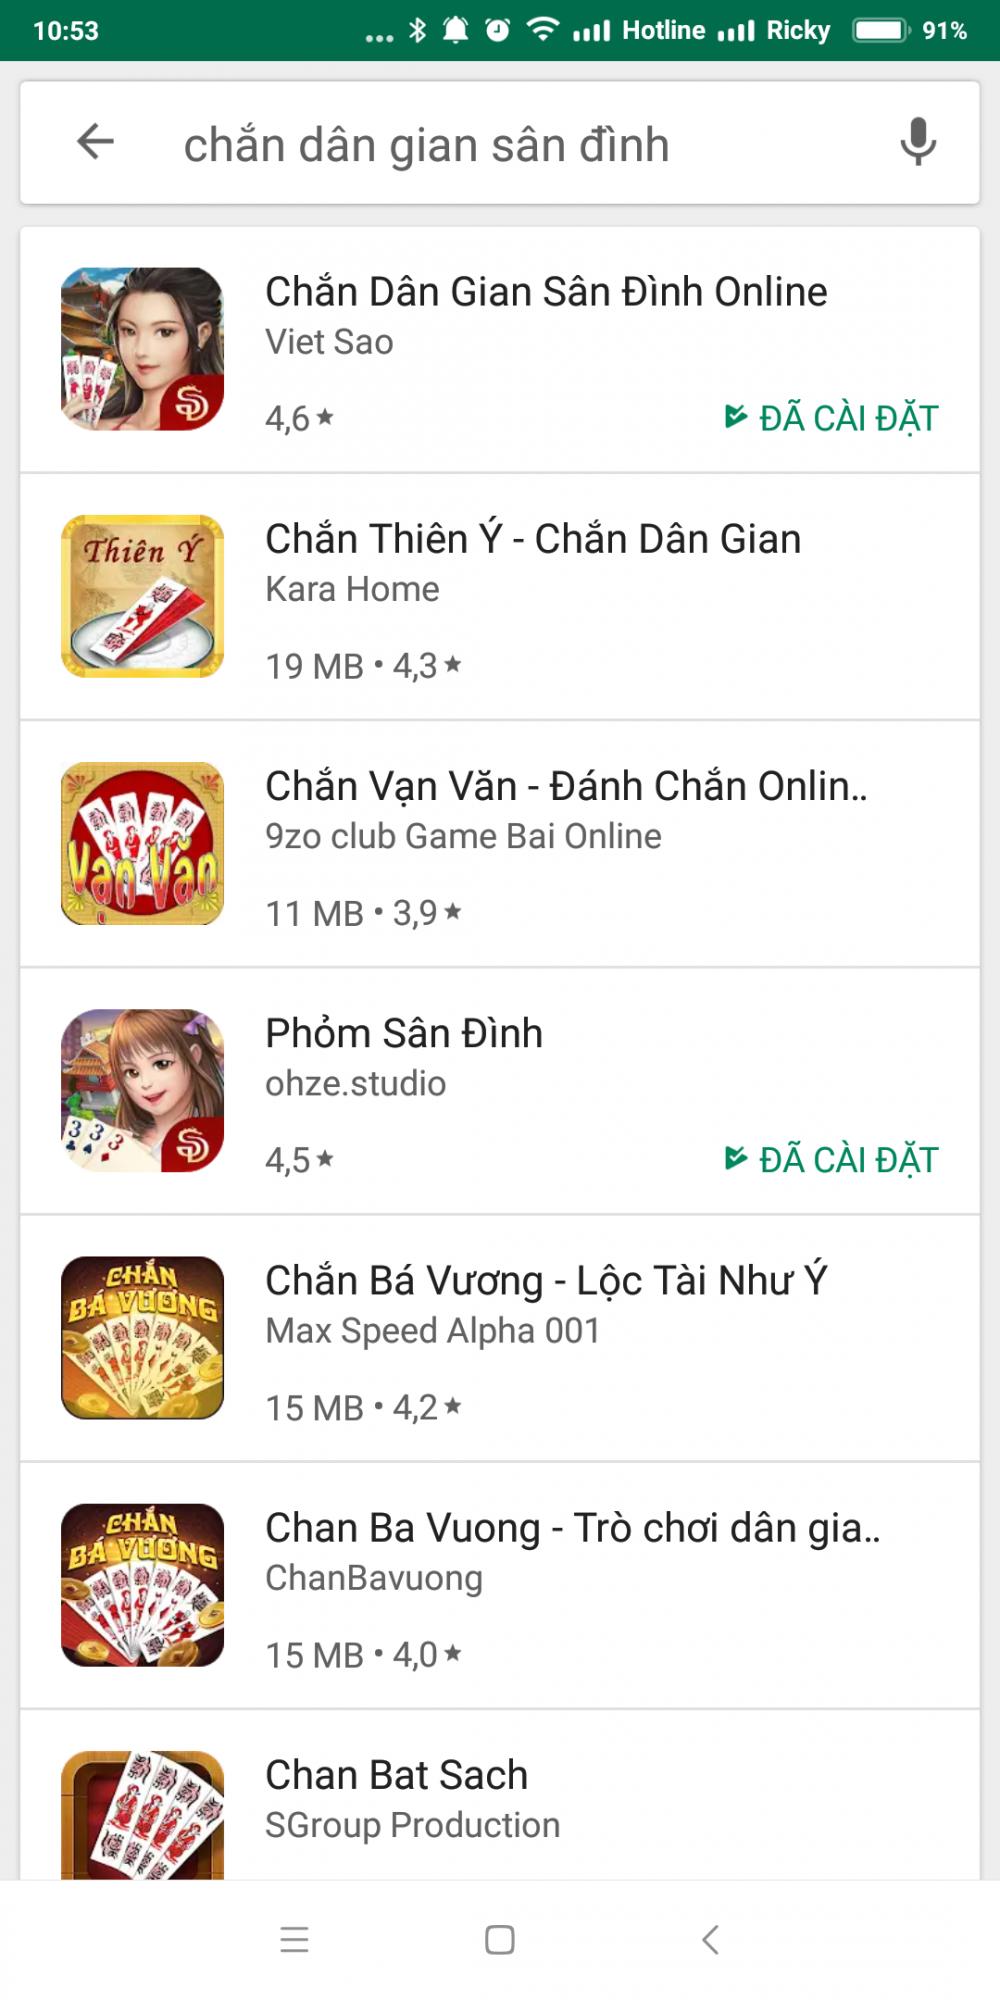 Screenshot_2019-02-08-10-53-06-313_com.android.vending.